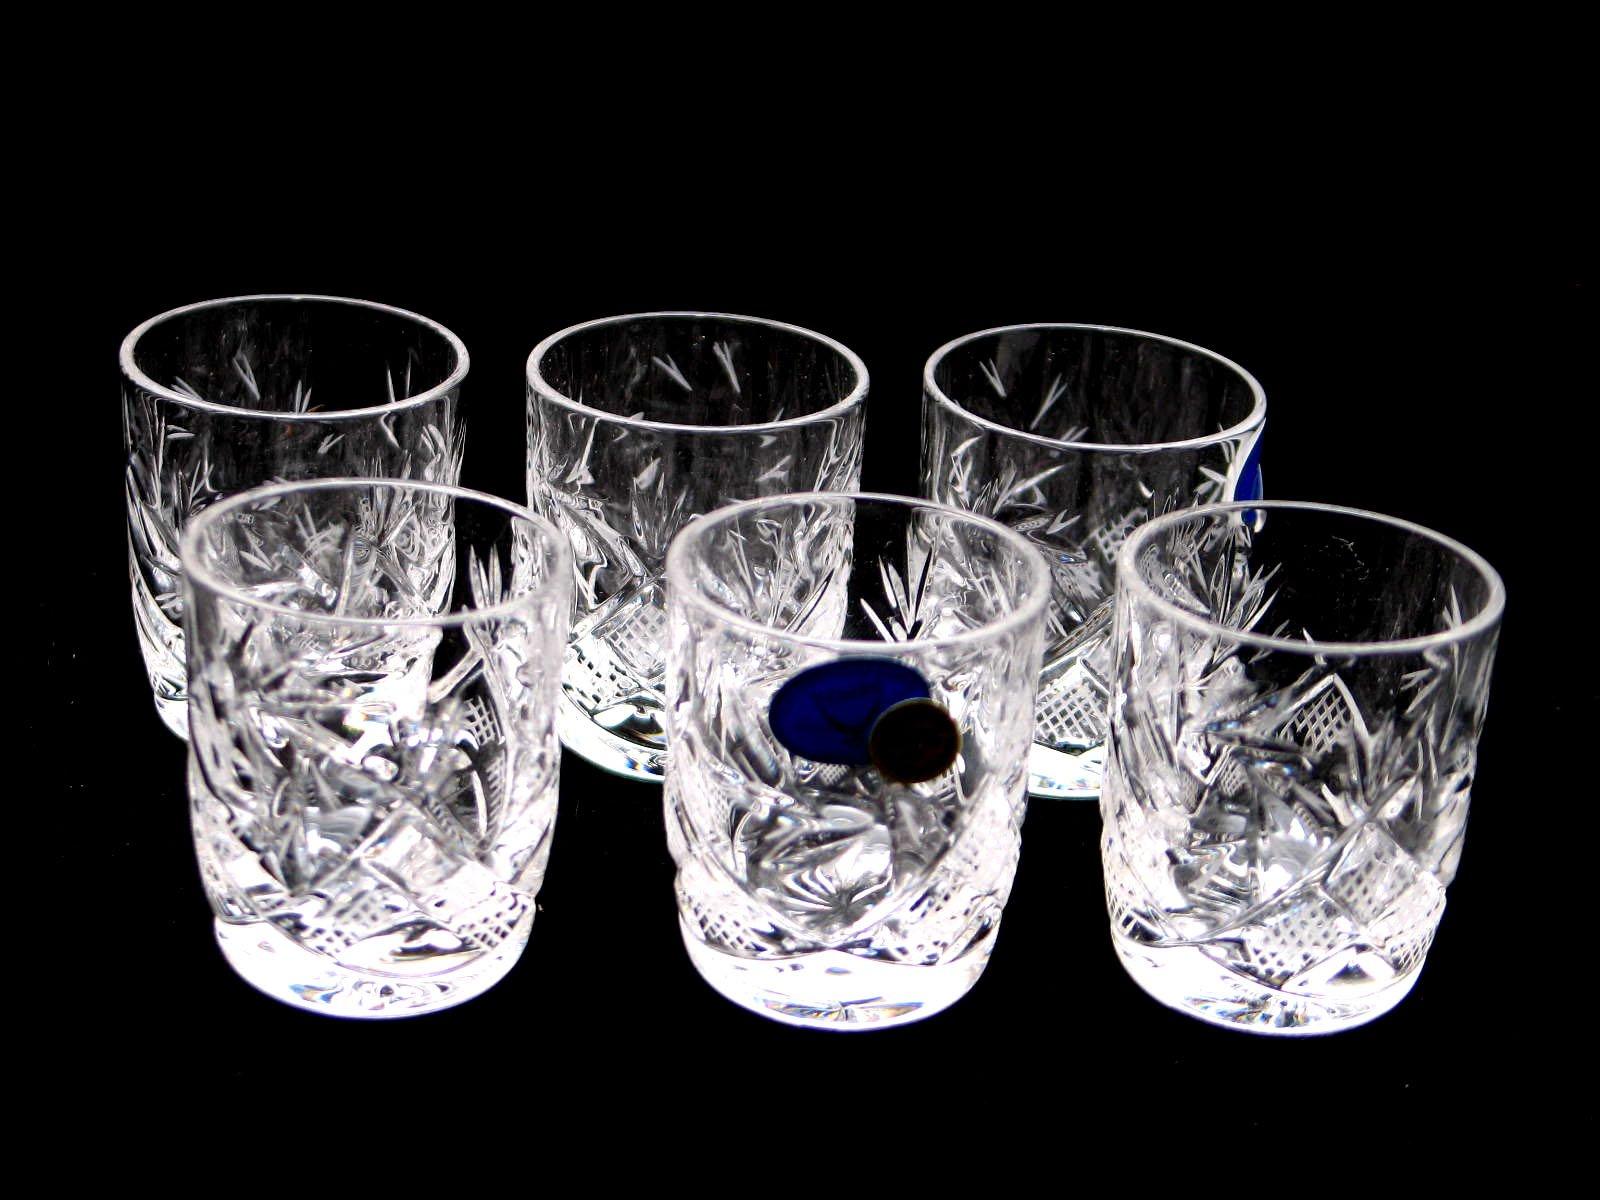 SET of 6 Russian Vintage CUT Crystal Stemless Shot Vodka Glasses 1.5 Oz / 50 ml, Old-fashioned Handmade European Crystal…